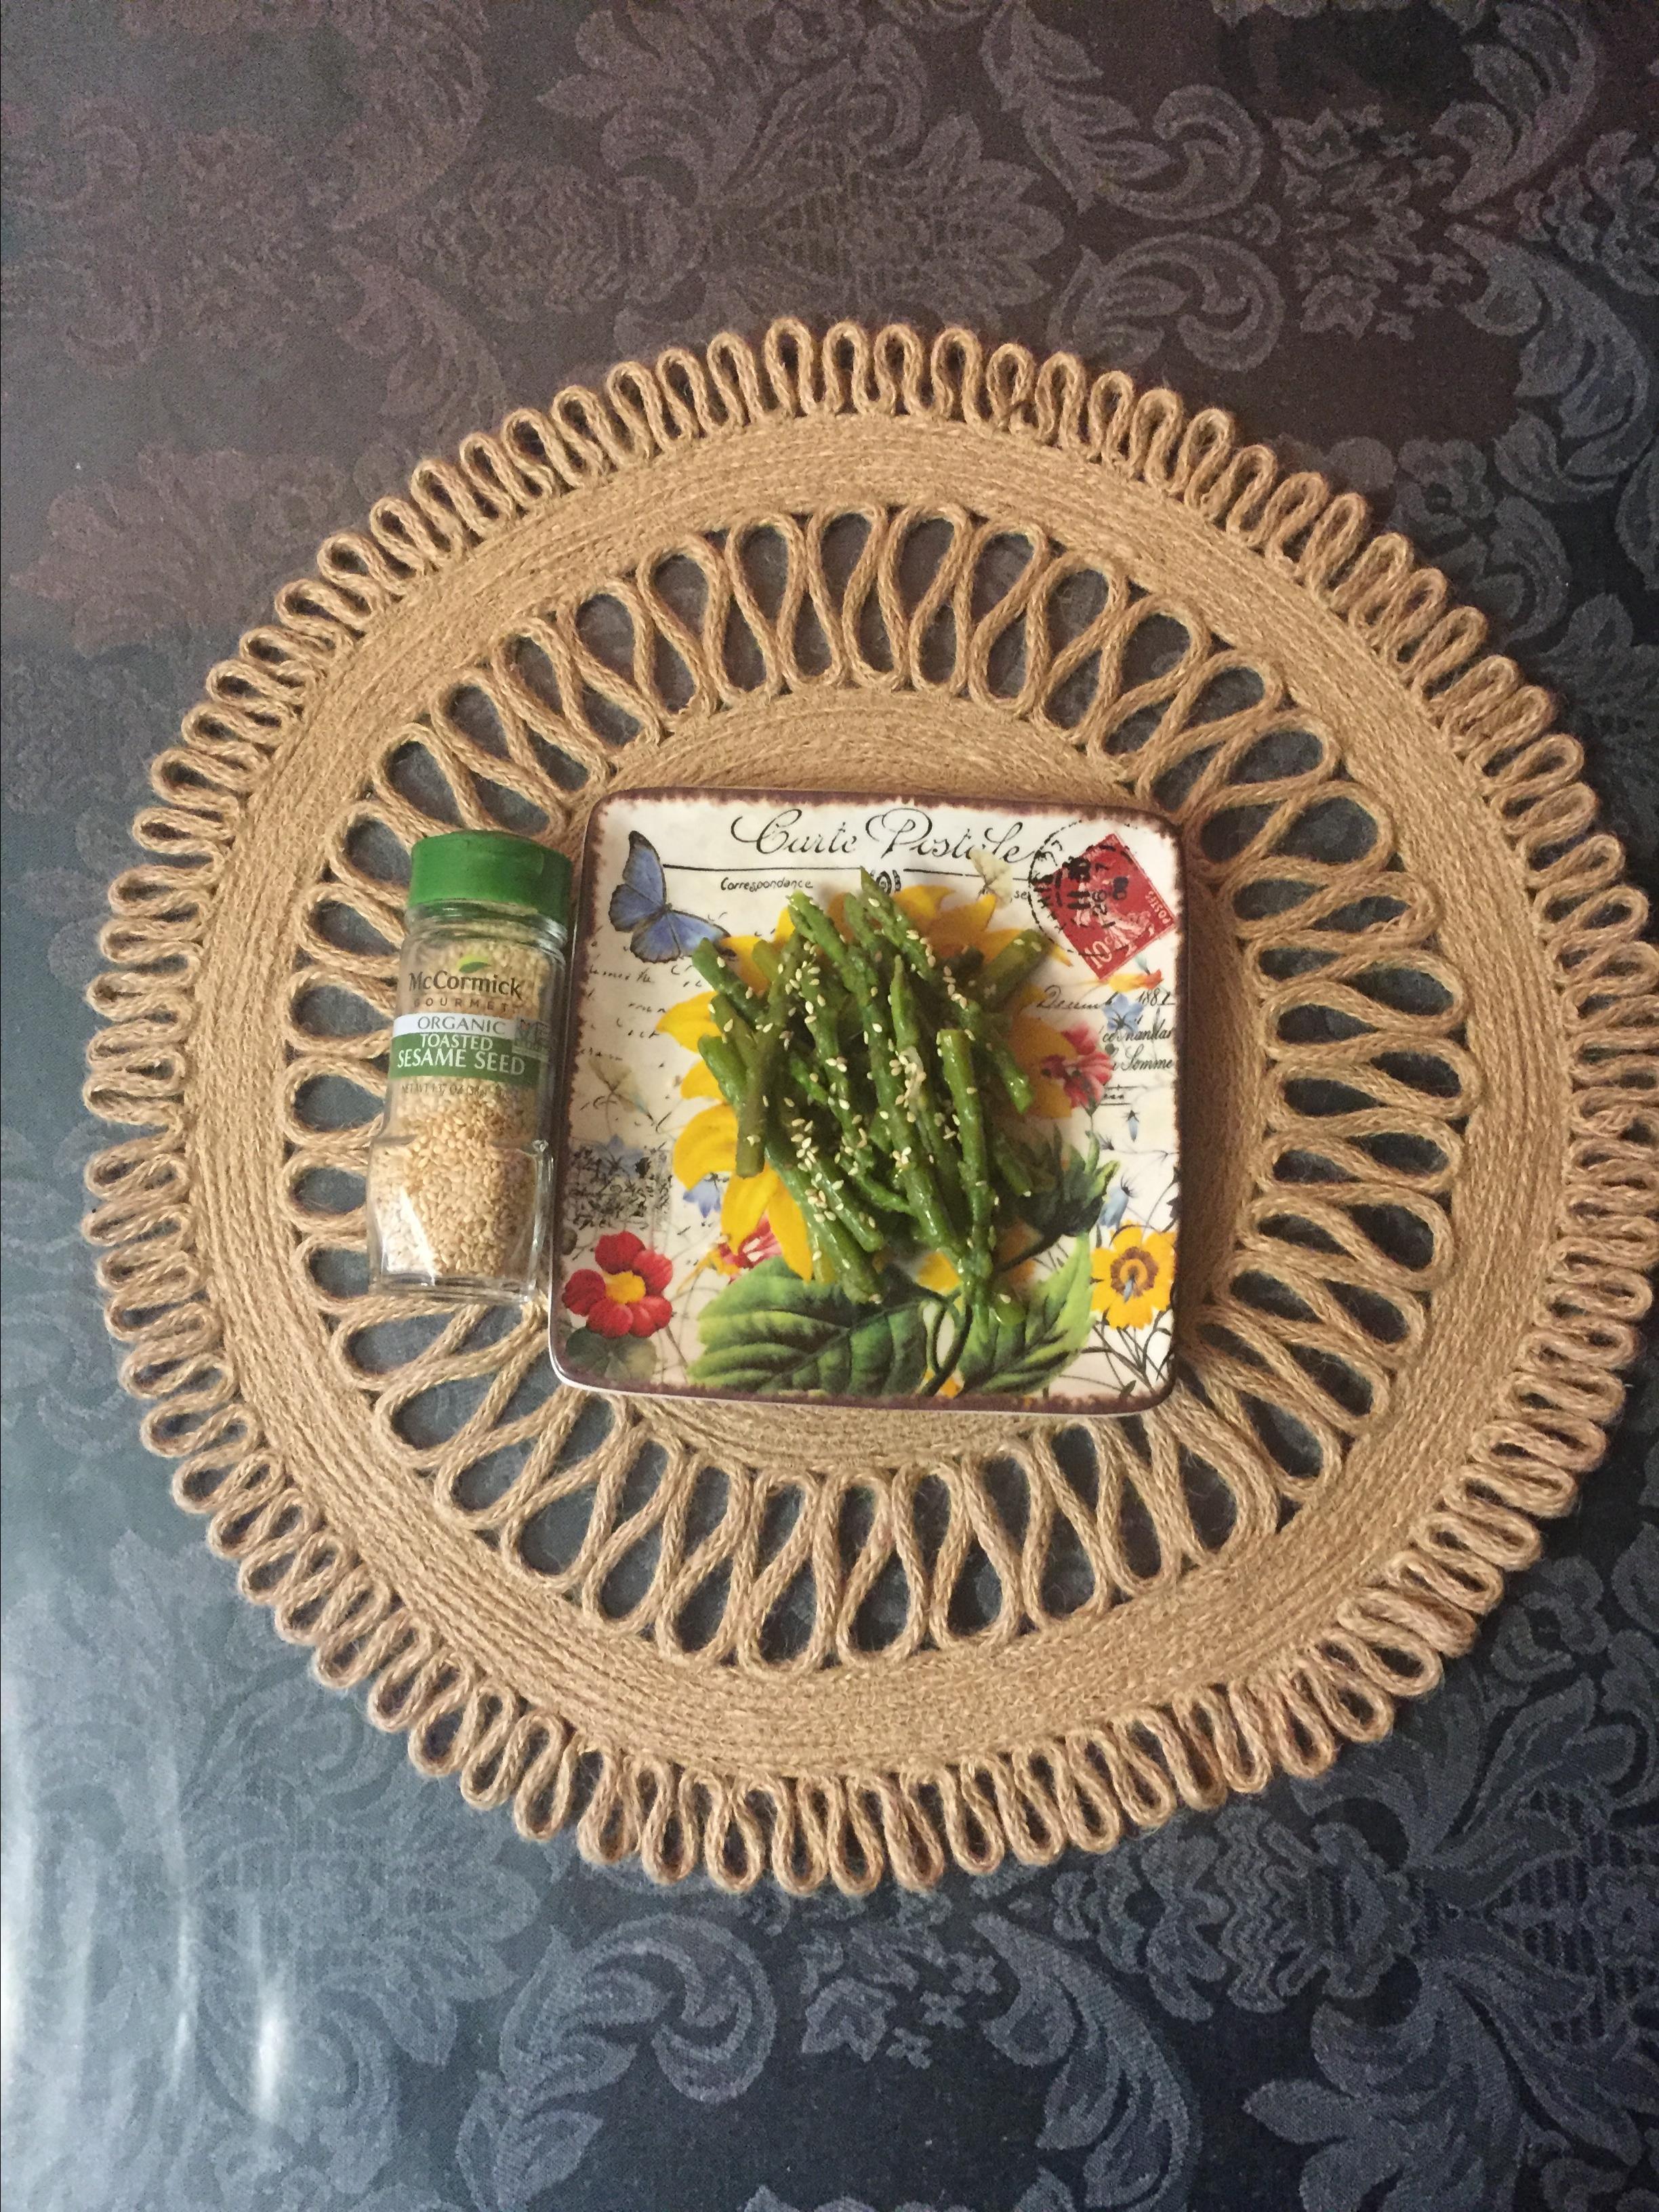 Stir-Fried Sesame Asparagus Sandy Kydd-stead